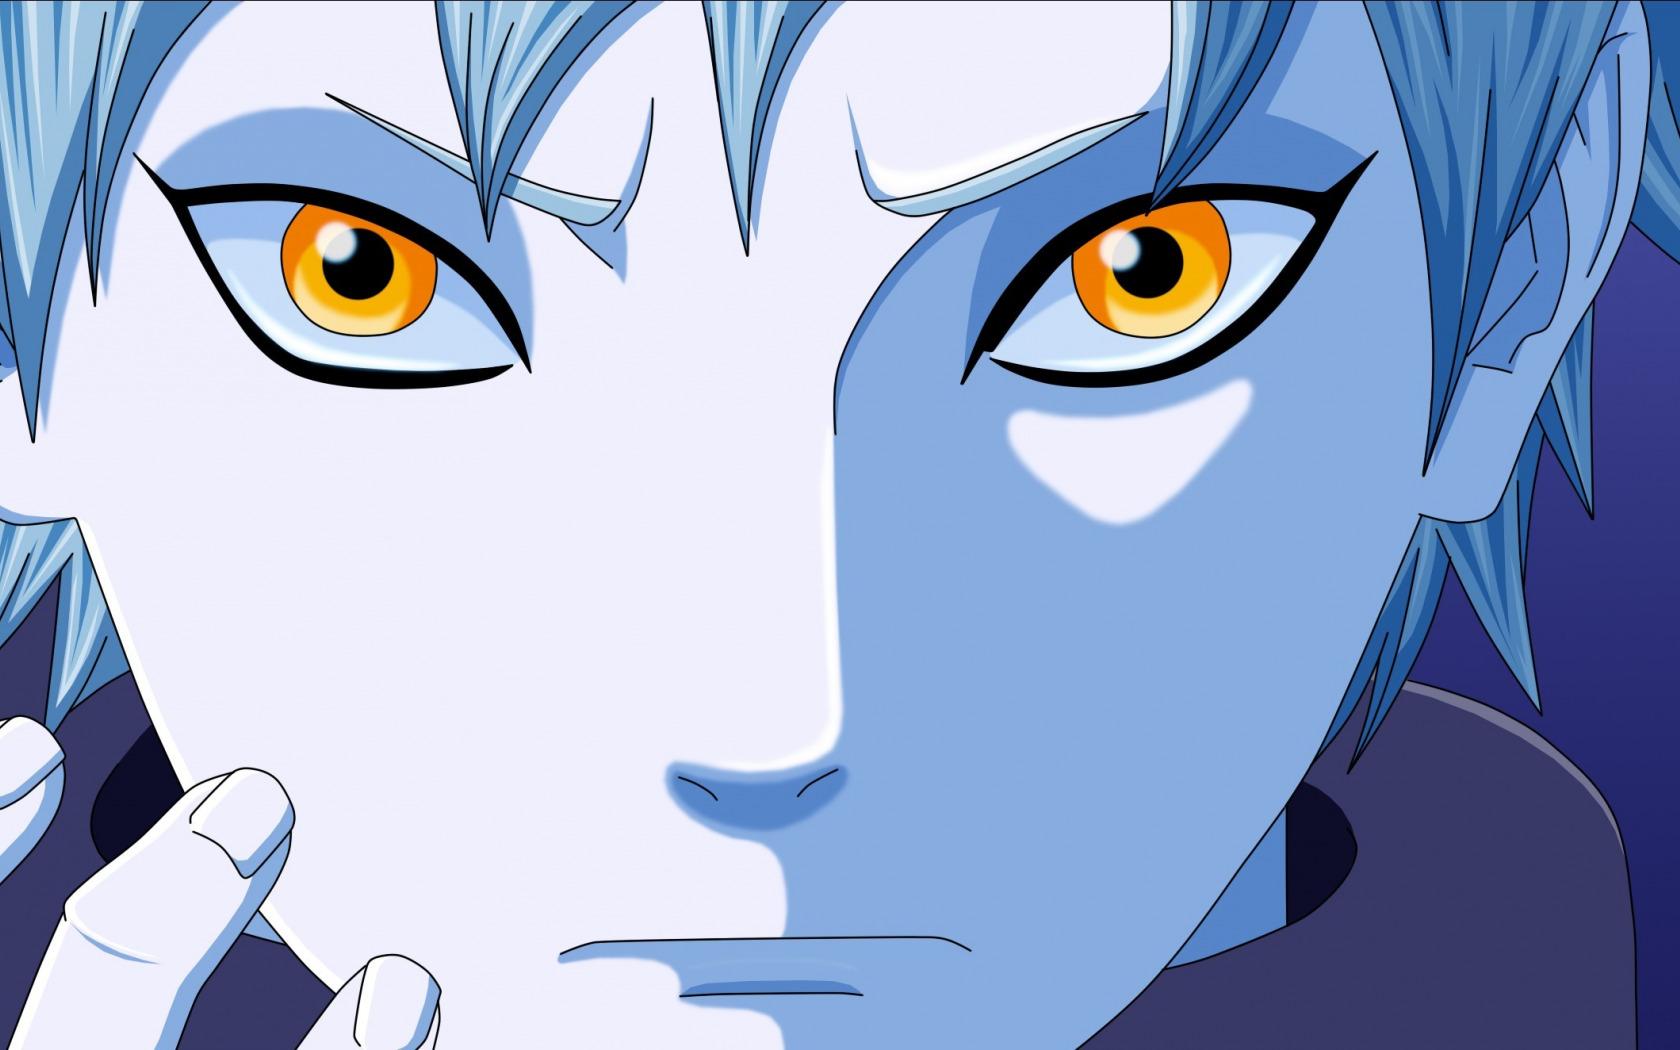 Download Wallpaper Wallpaper Sword Game Snake Blue Anime